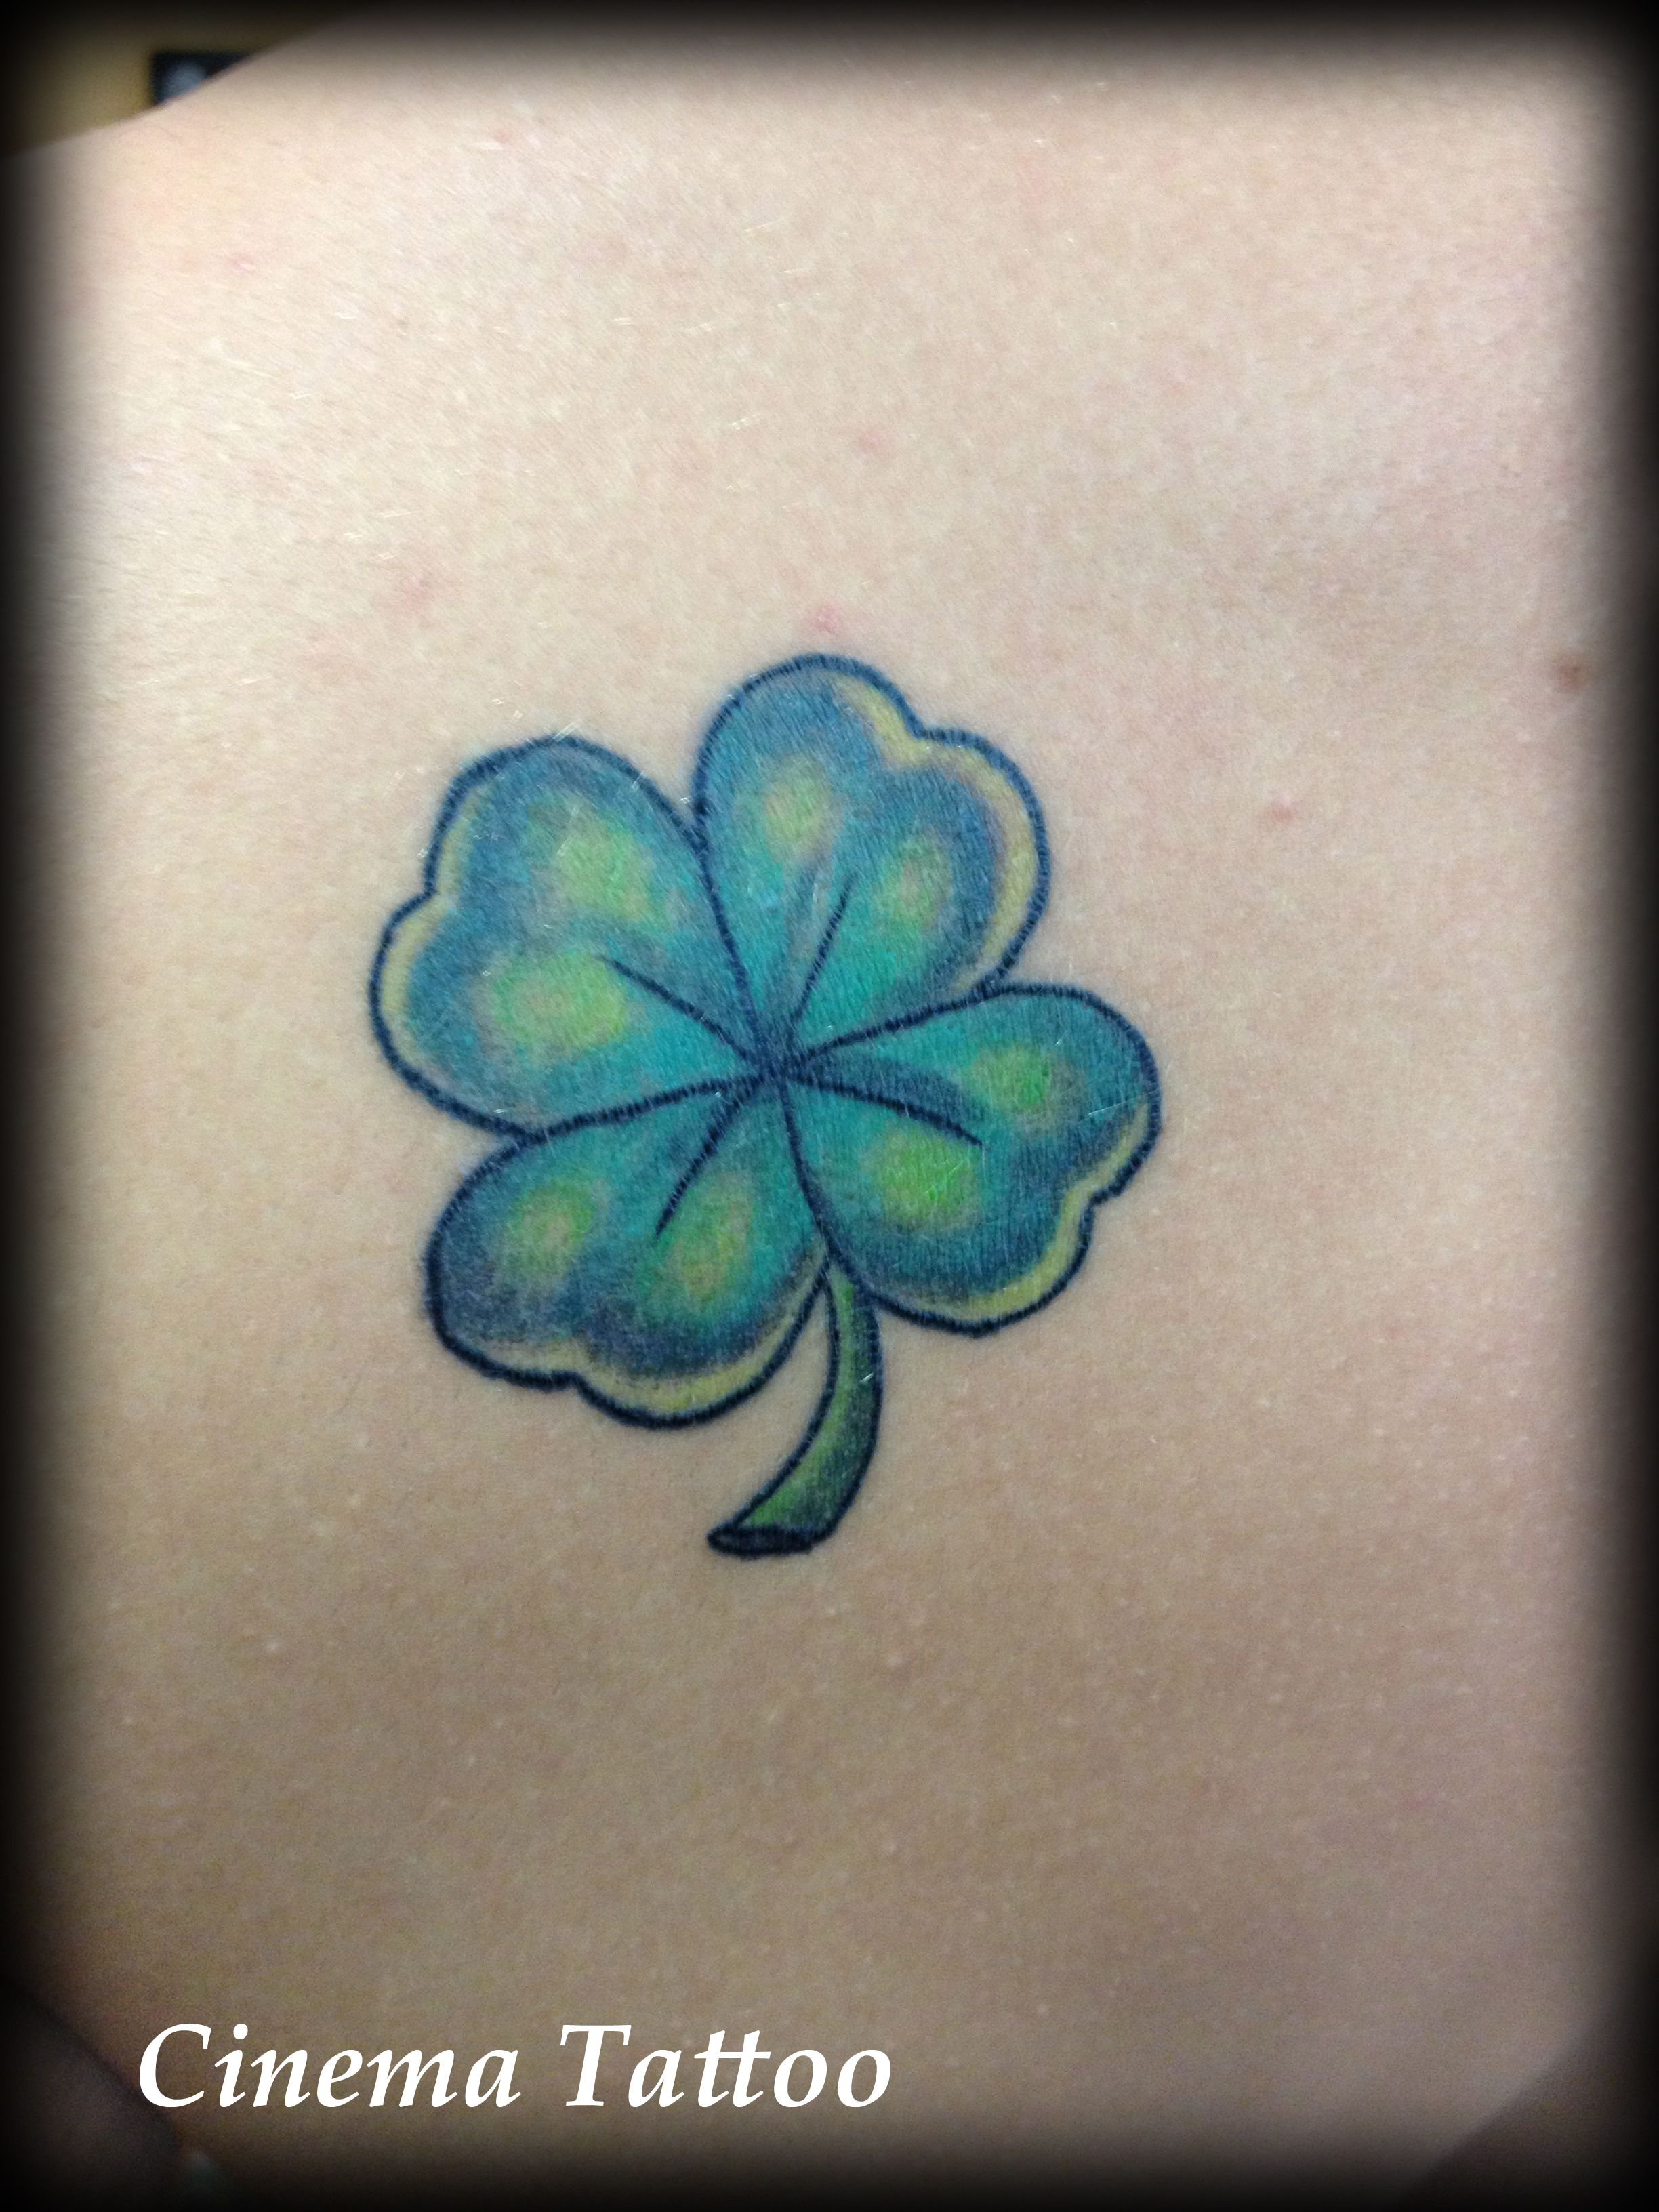 cinema tattoo | Tatuajes trebol 4 hojas, Treboles 4 hojas, Trebol